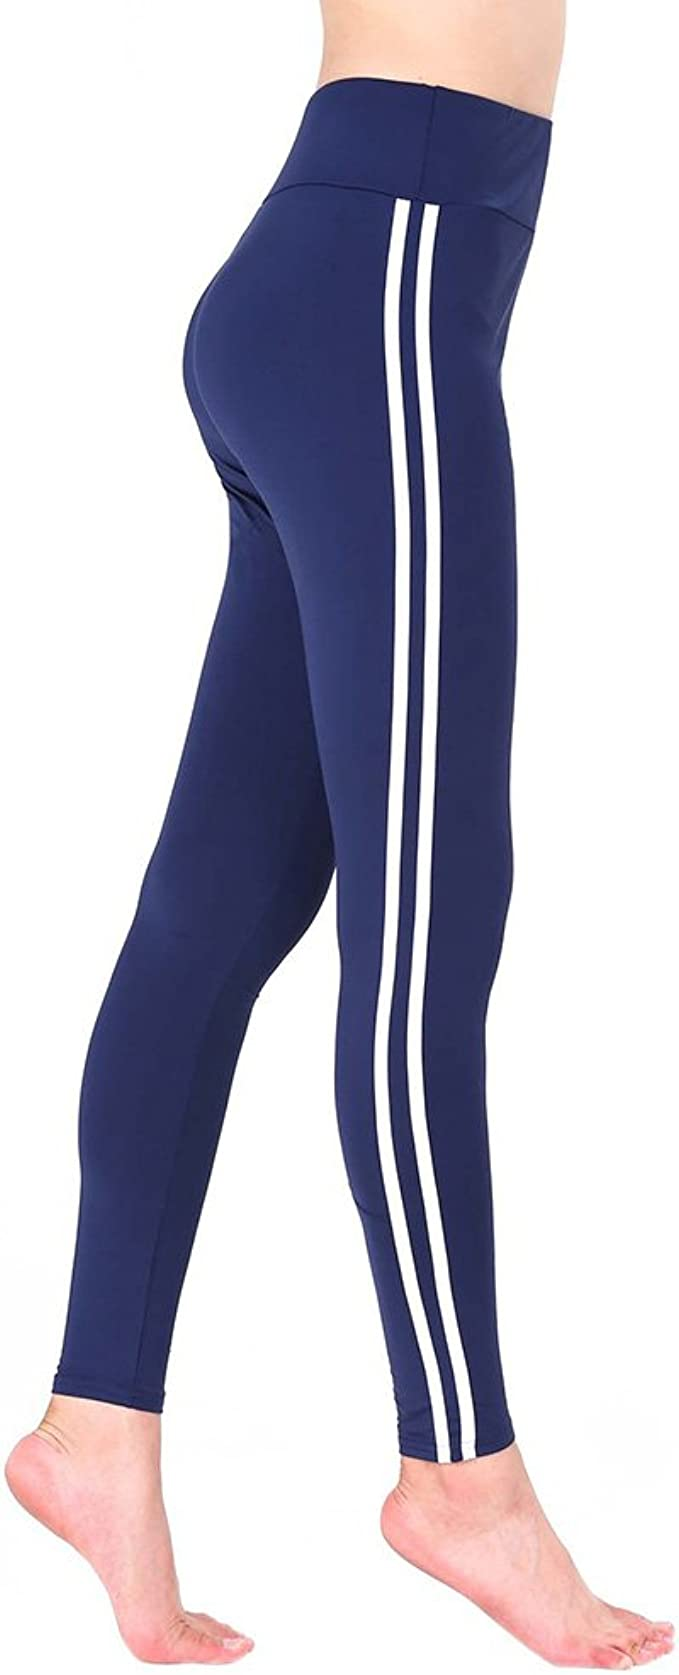 junkai Leggins Mujer Deportivos, Pantalones de chándal de Mujer ...